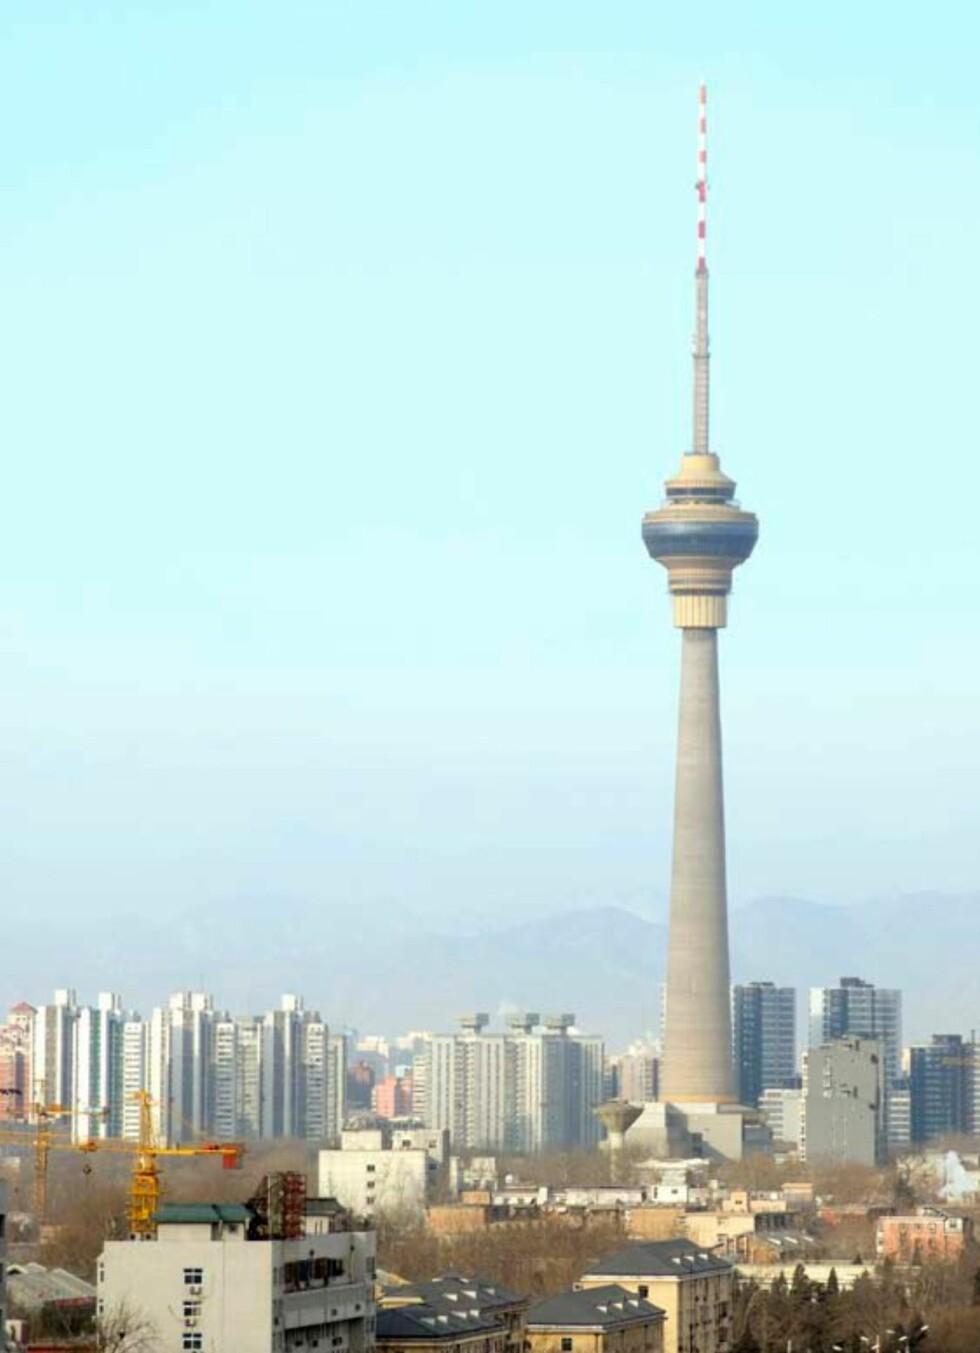 Beijing - nå med tv-tårnet. Foto: Hotels.com